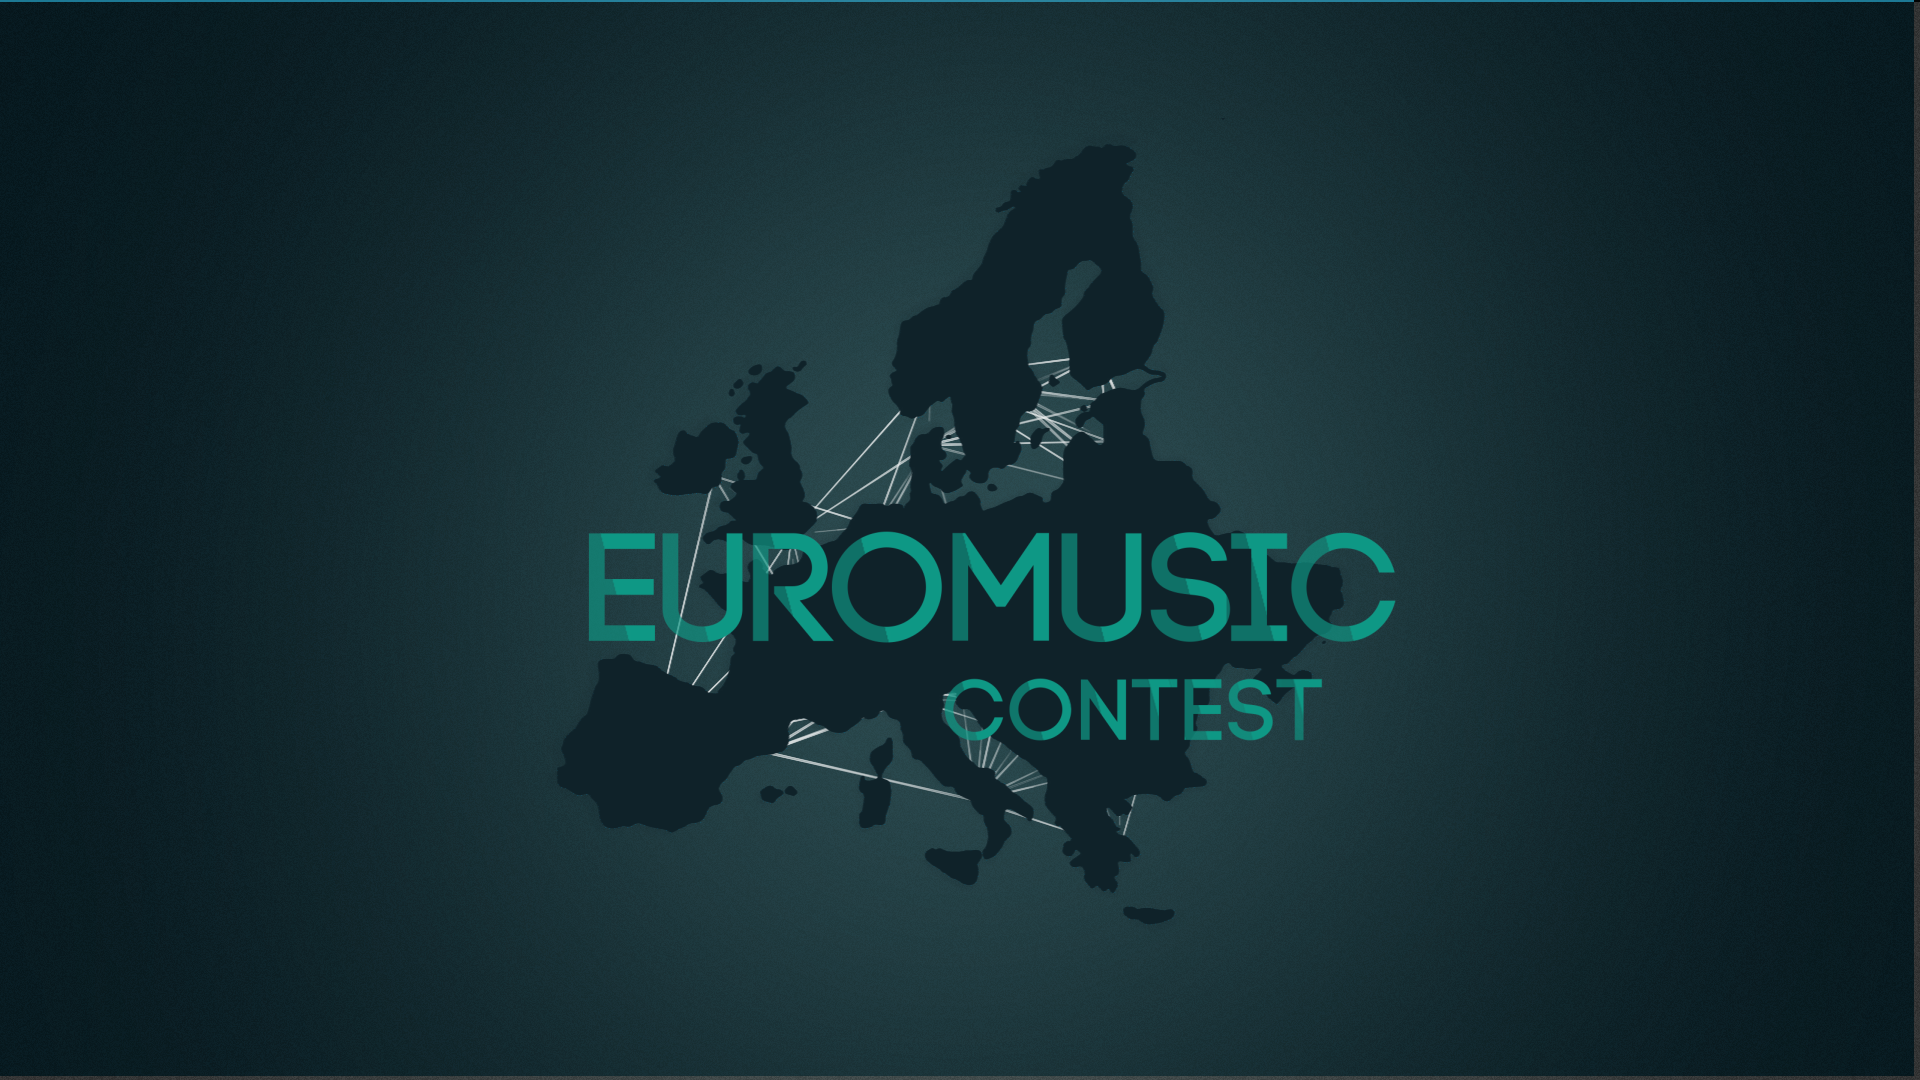 EuroMusic contest